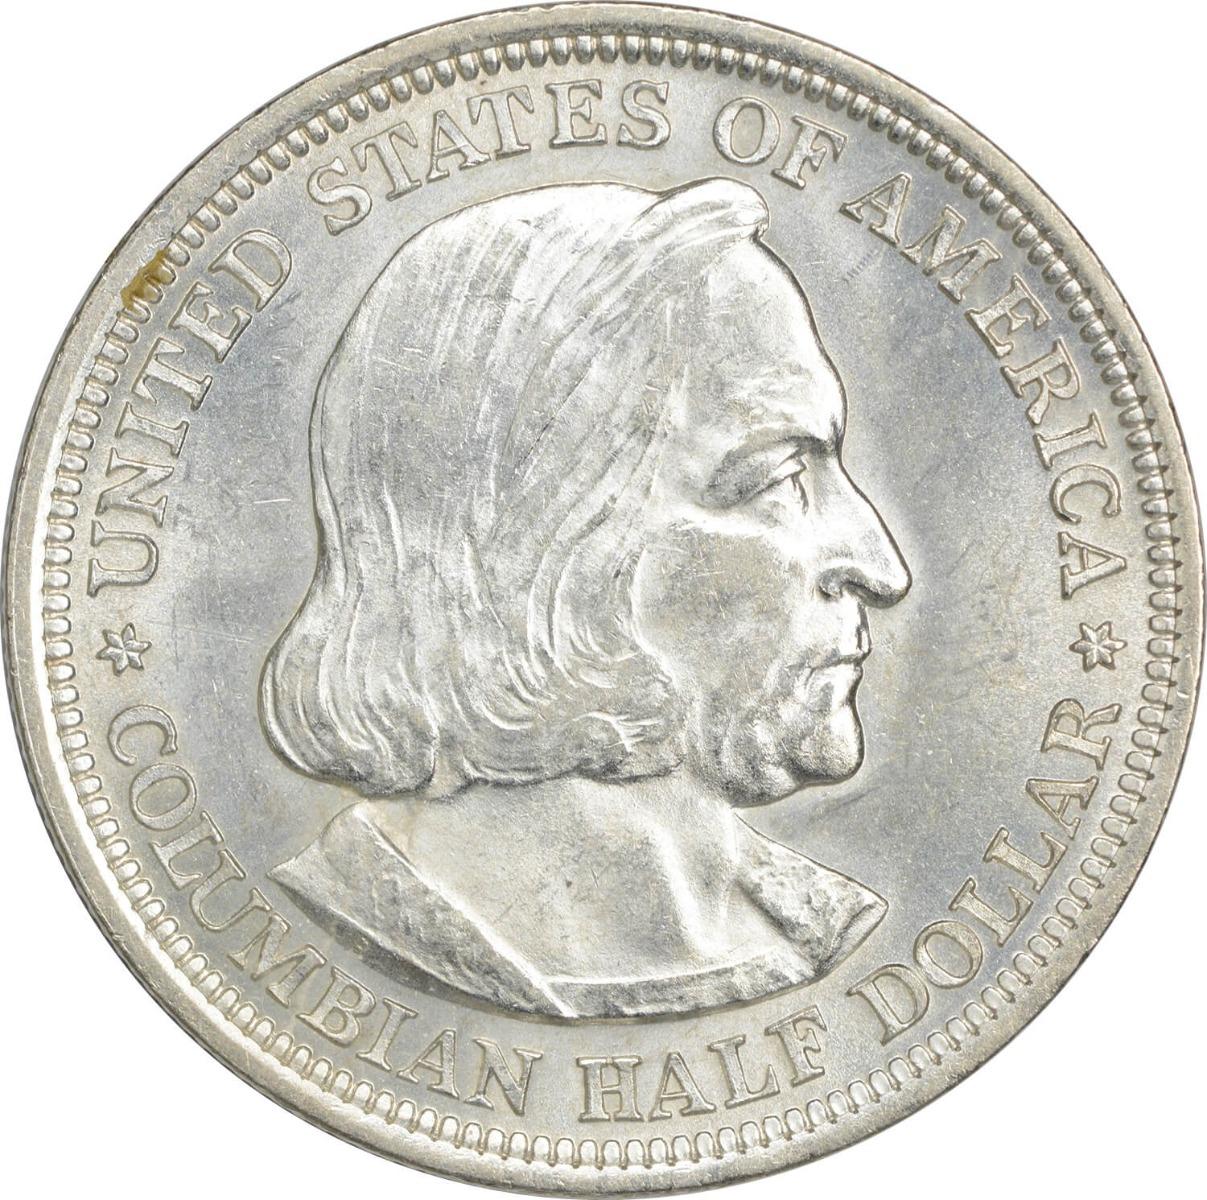 Columbian Commemorative Half Dollar 1892, MS63, Uncertified